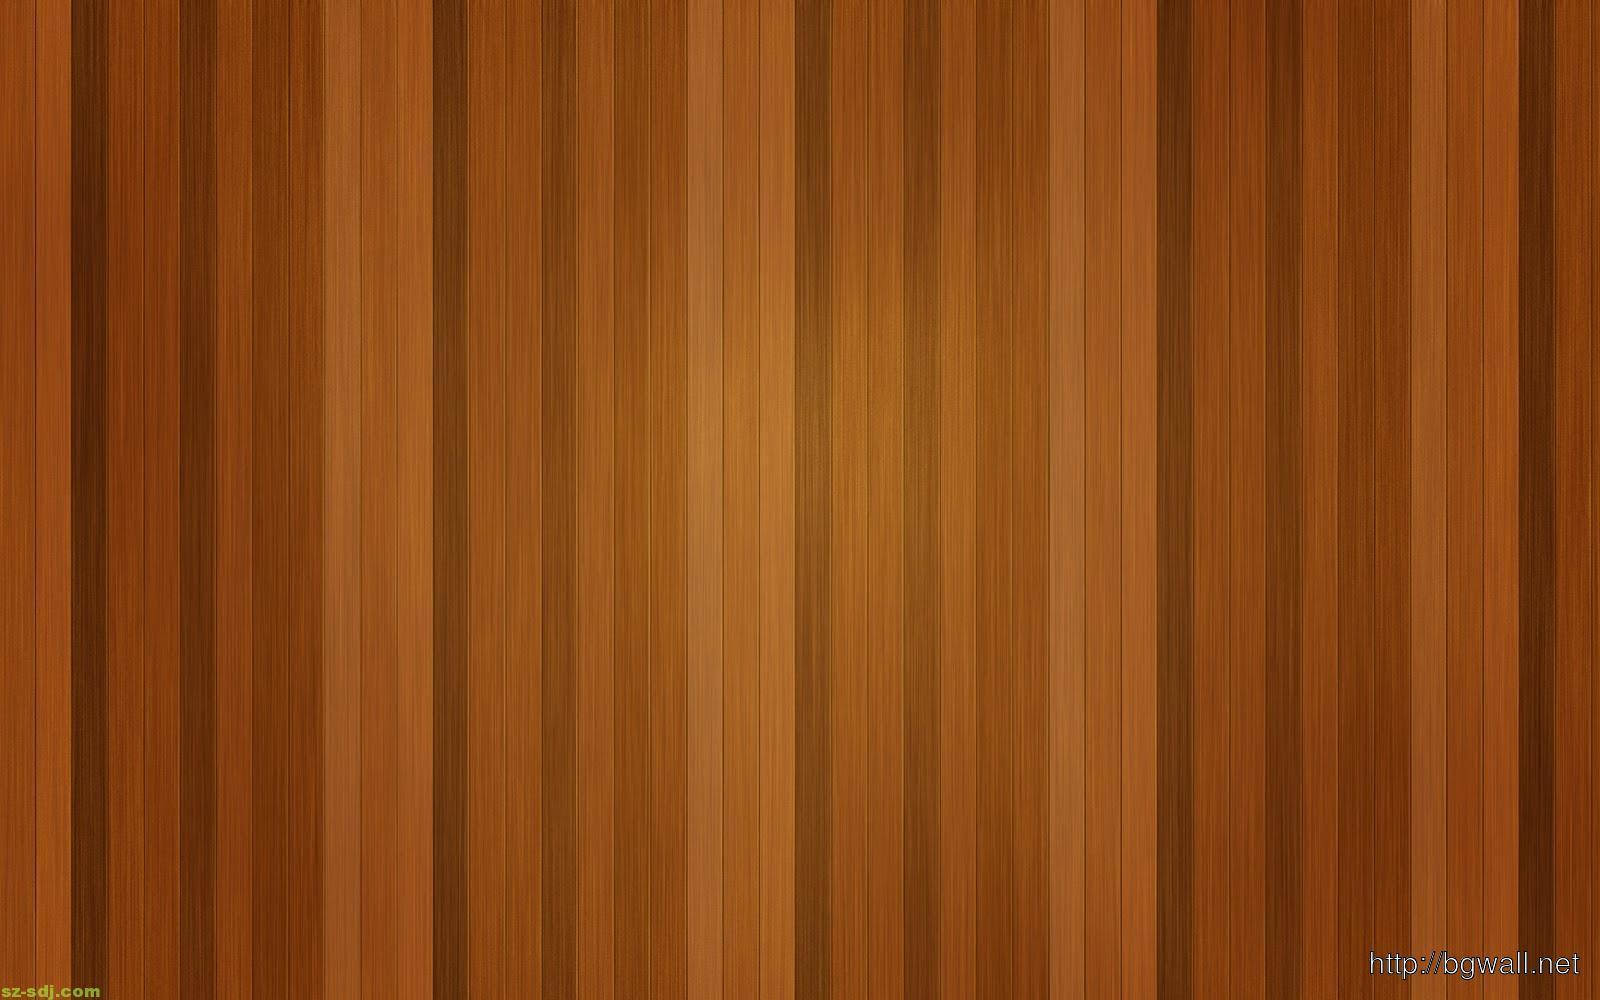 Wood texture wallpapers full hd wallpaper search - Brown Strip Wood Background Wallpaper Background Wallpaper Hd